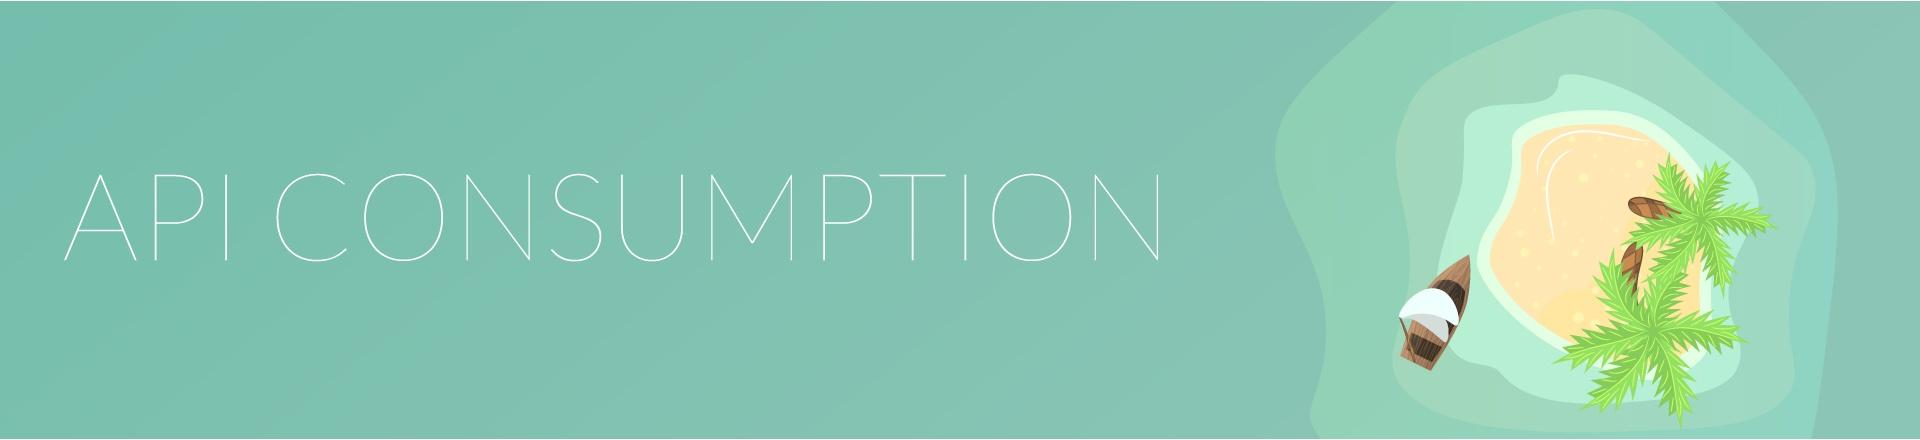 API Consumption- Optimizing APIs for developers and citizen integrators